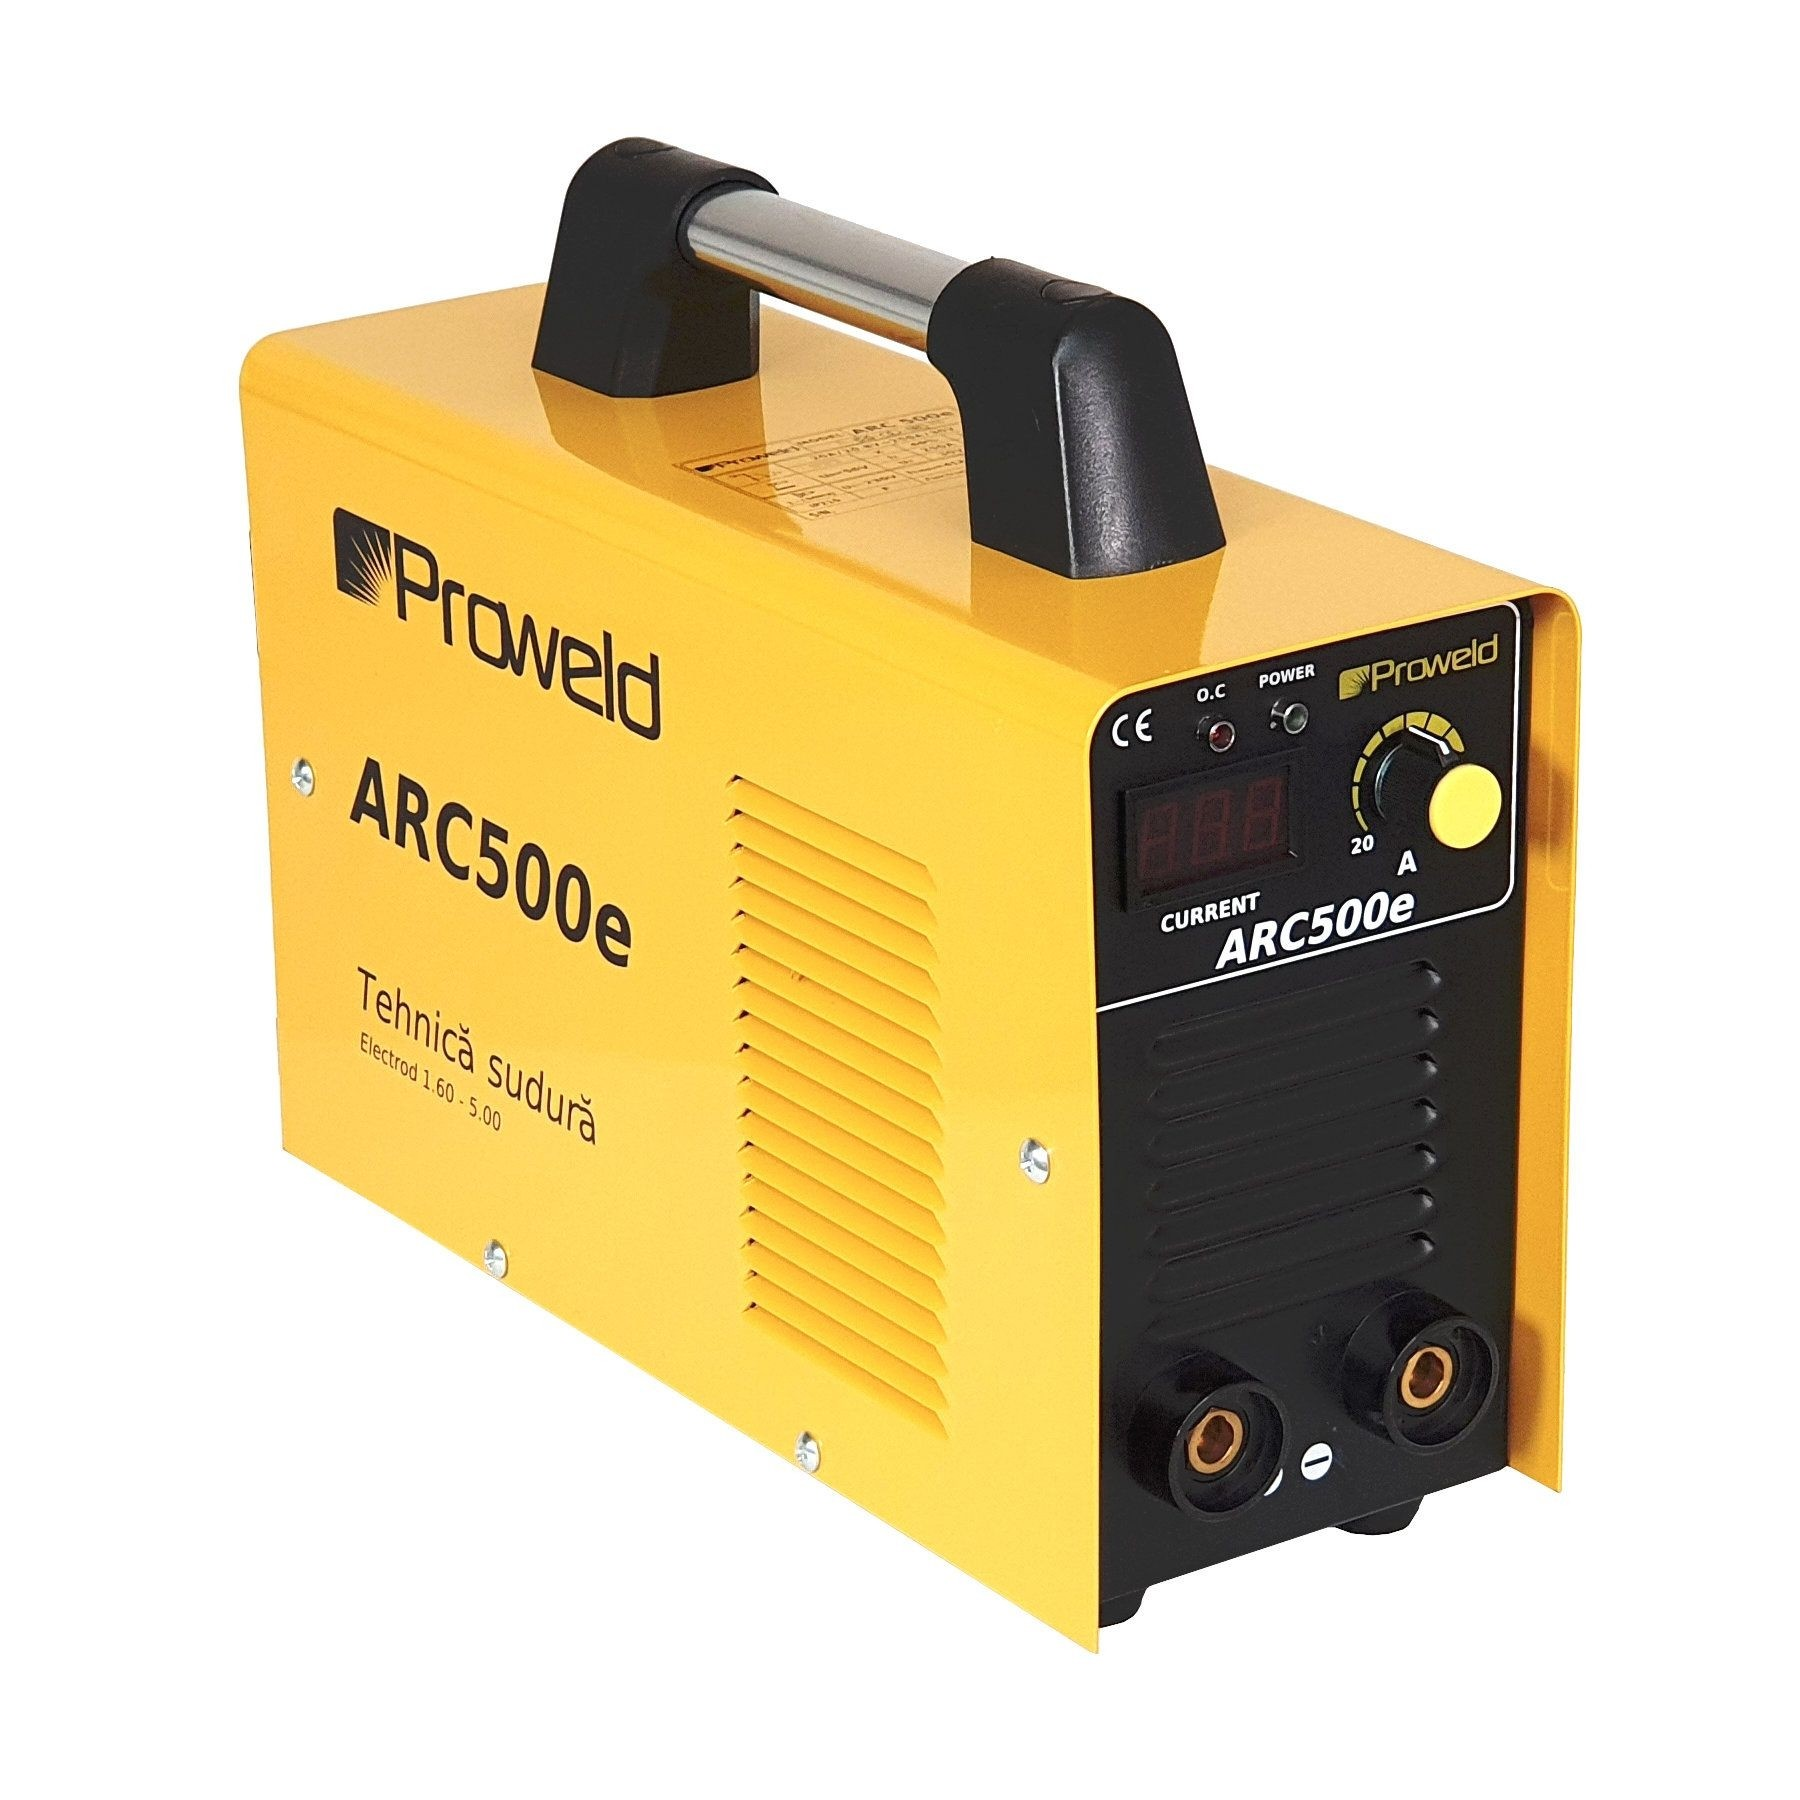 Invertor de sudura ProWELD ARC500e, 230 V, 20-250 A, electrod max. 5 mm, valiza transport